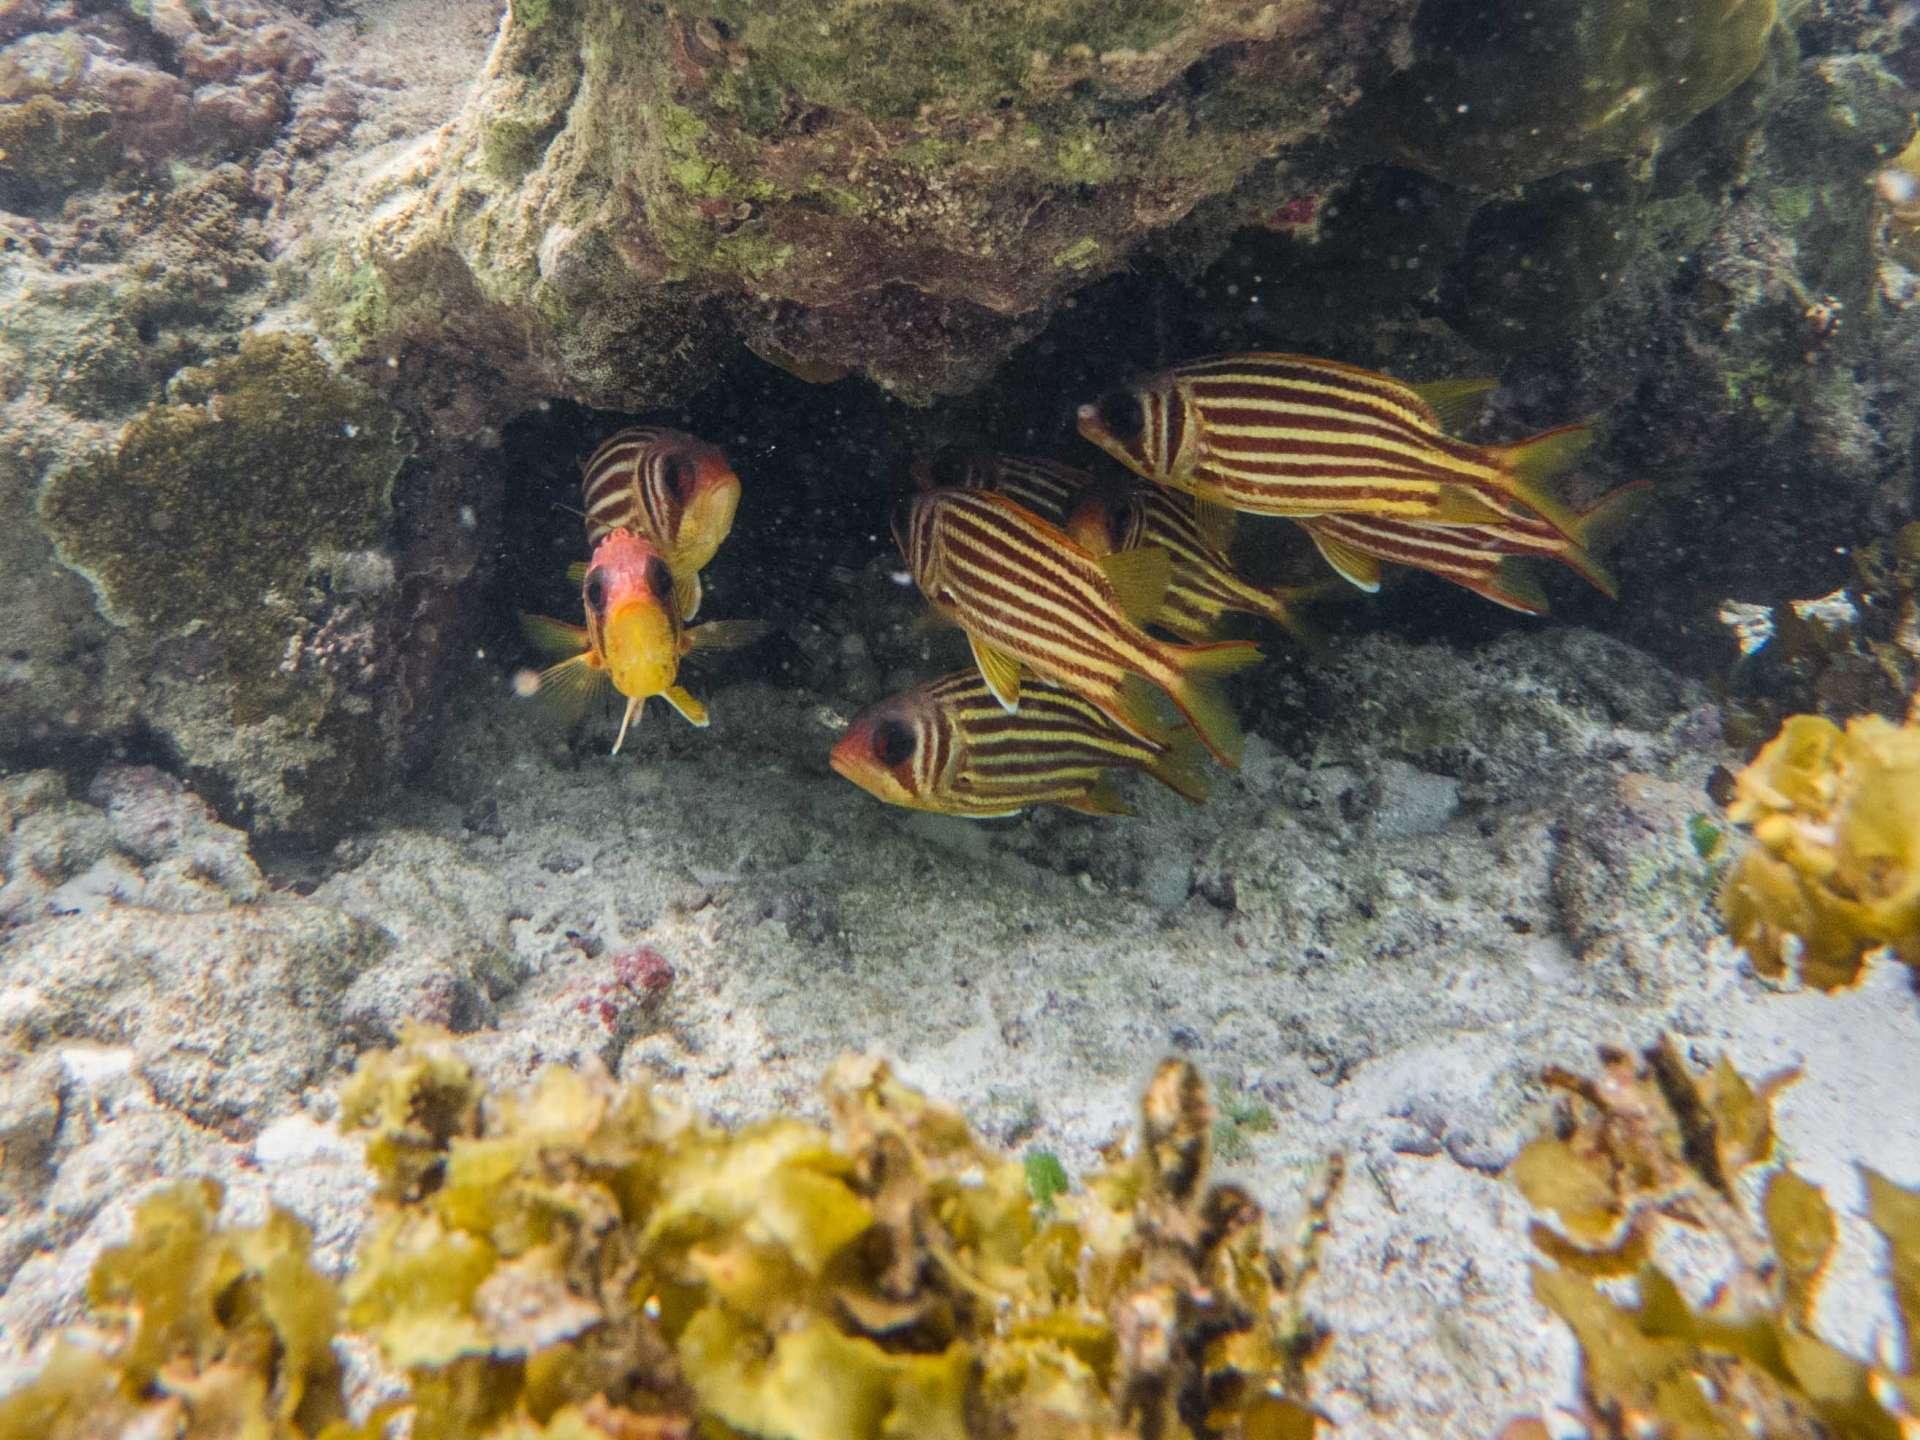 Anse Lazio Seychelles travel photography underwater snorkeling enrico pescantini.GPR.GPR